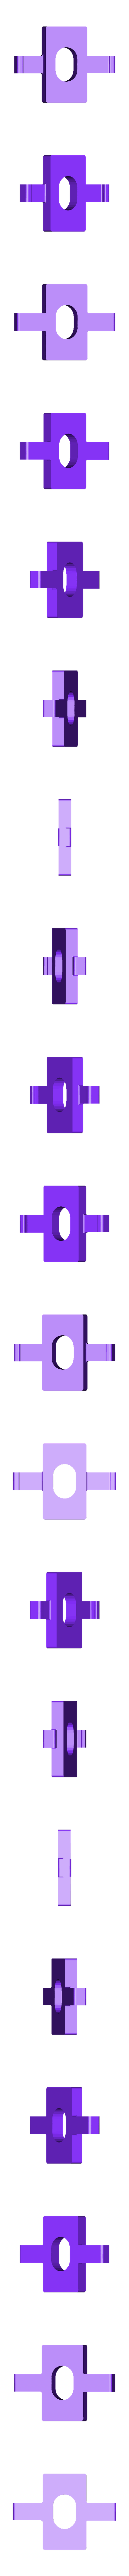 Tapa_Soporte_husillo_con_muelle.stl Télécharger fichier STL gratuit Parte Superior Husillo eje Z con muelle para perfil de aluminio 2040 • Plan imprimable en 3D, celtarra12